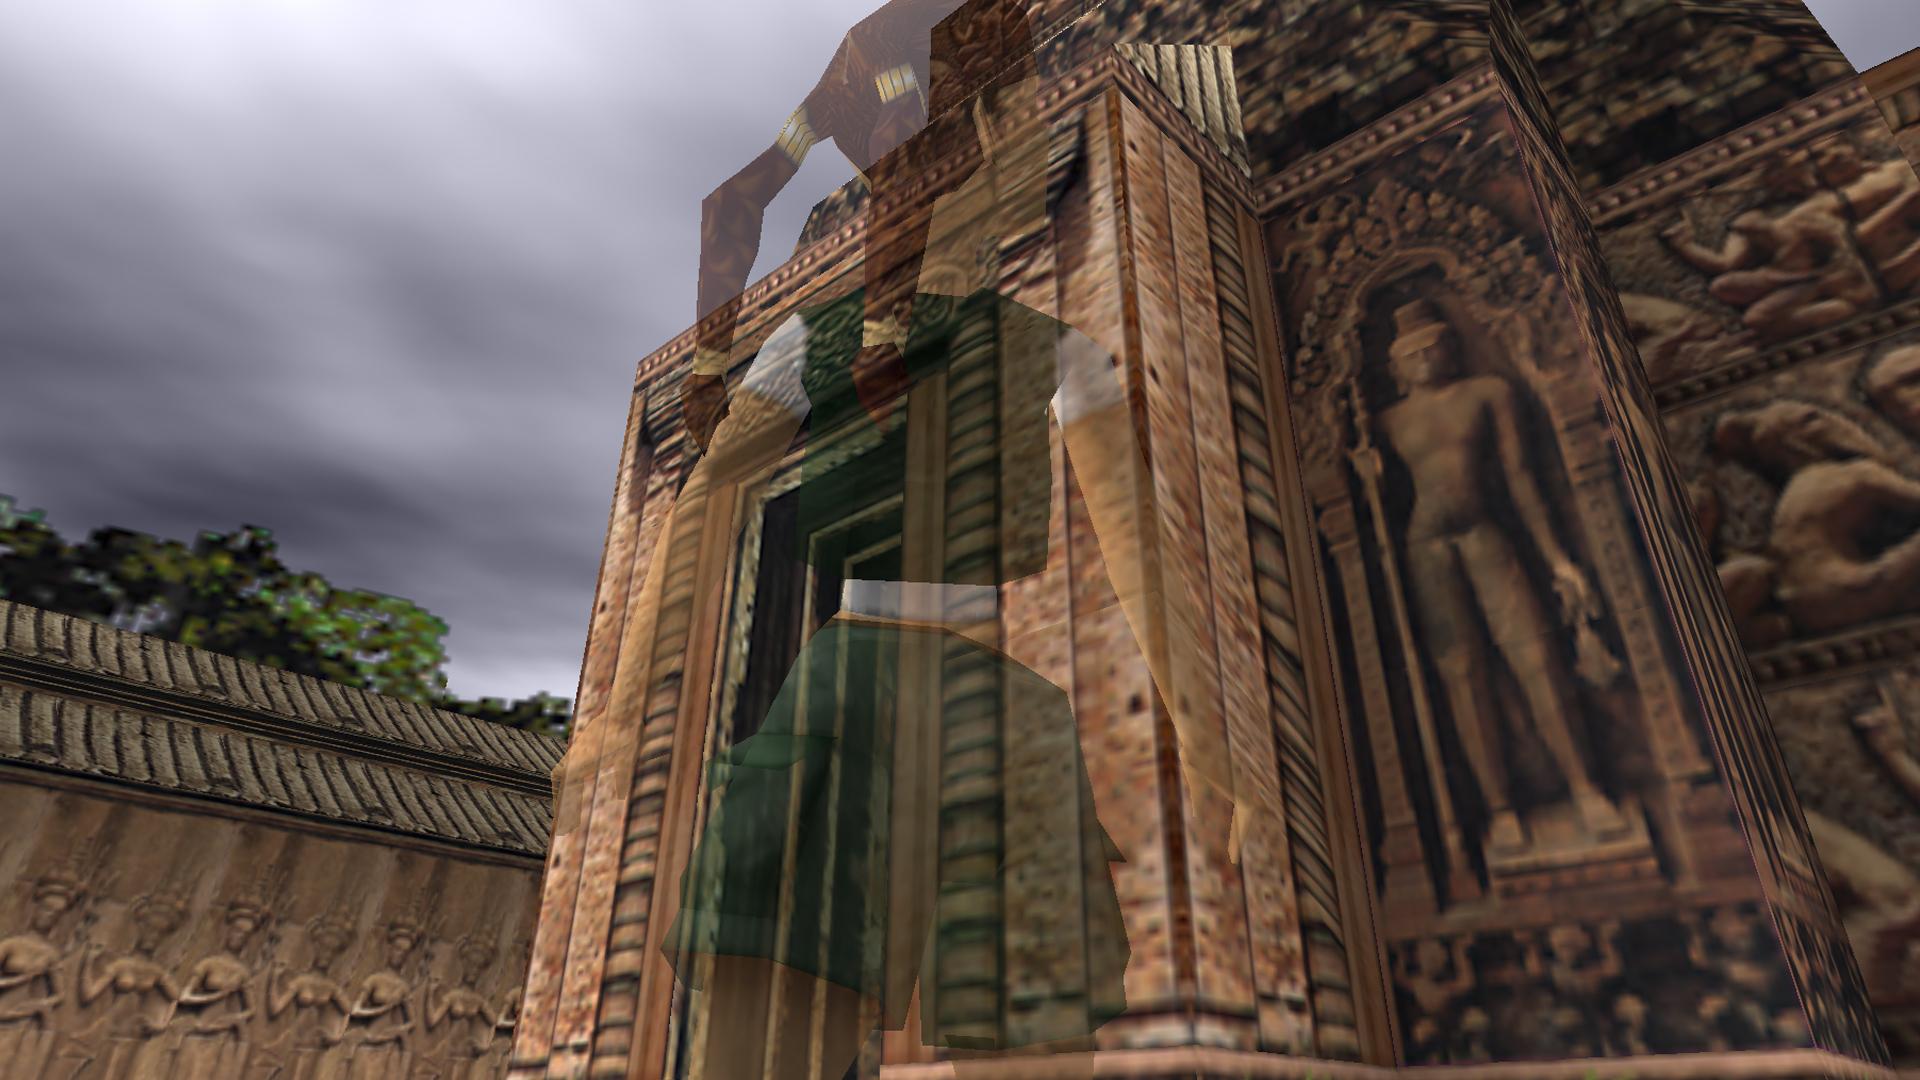 Tomb Raider 4 - Angkor Wat Original